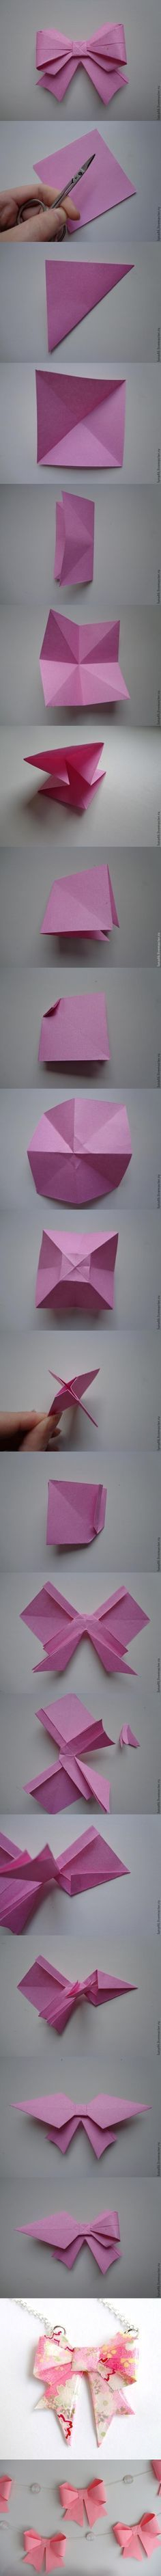 #diy #crafts #paperbow DIY Origami-Paper-Bow 3 Mehr